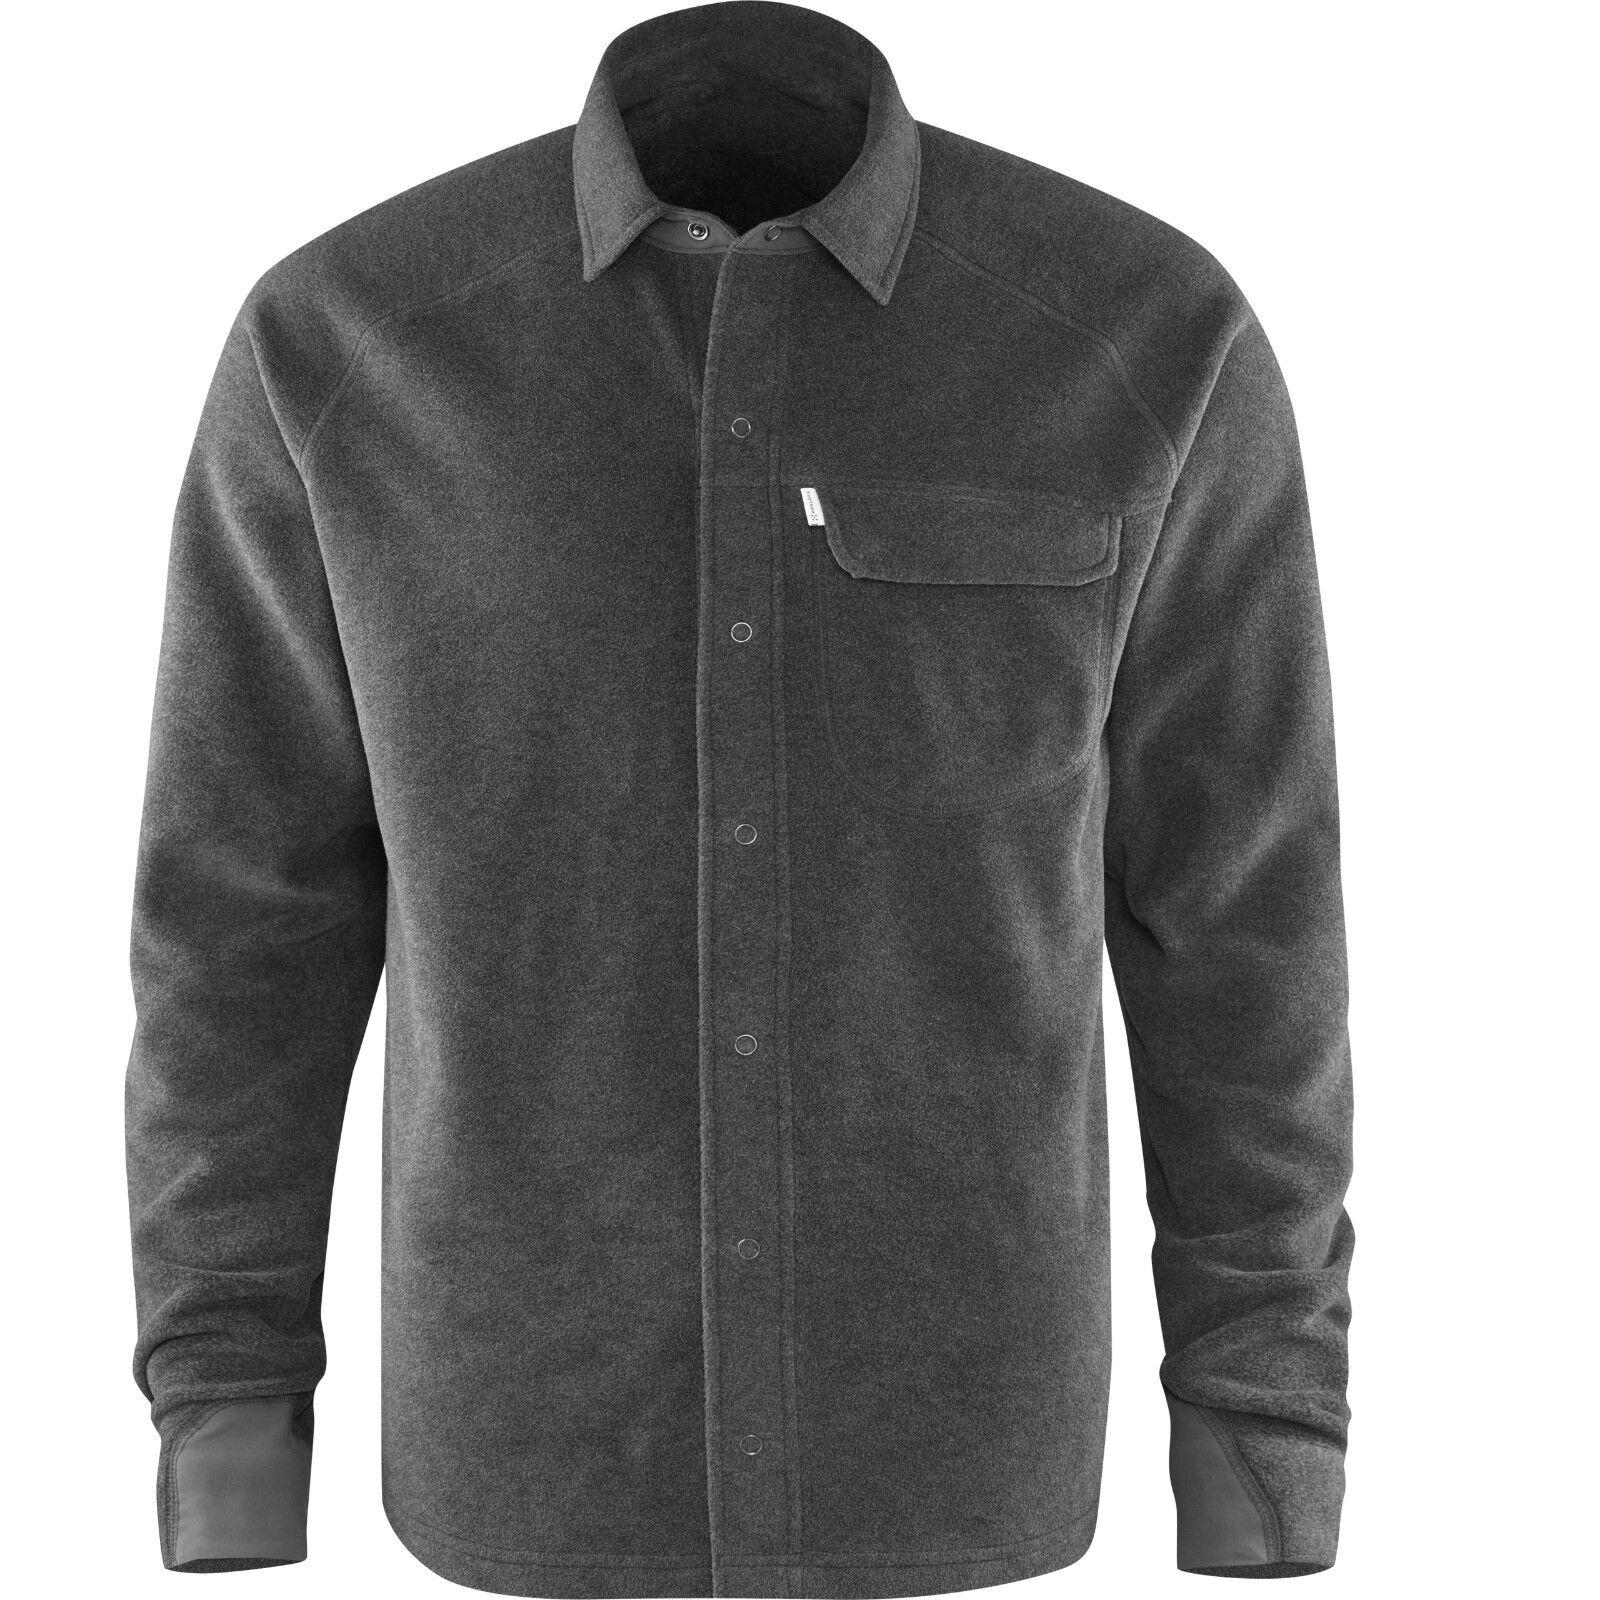 Haglöfs Tajga LS Shirt Men, Fleece Shirt, Men's Long Sleeve Shirt, Magnetite